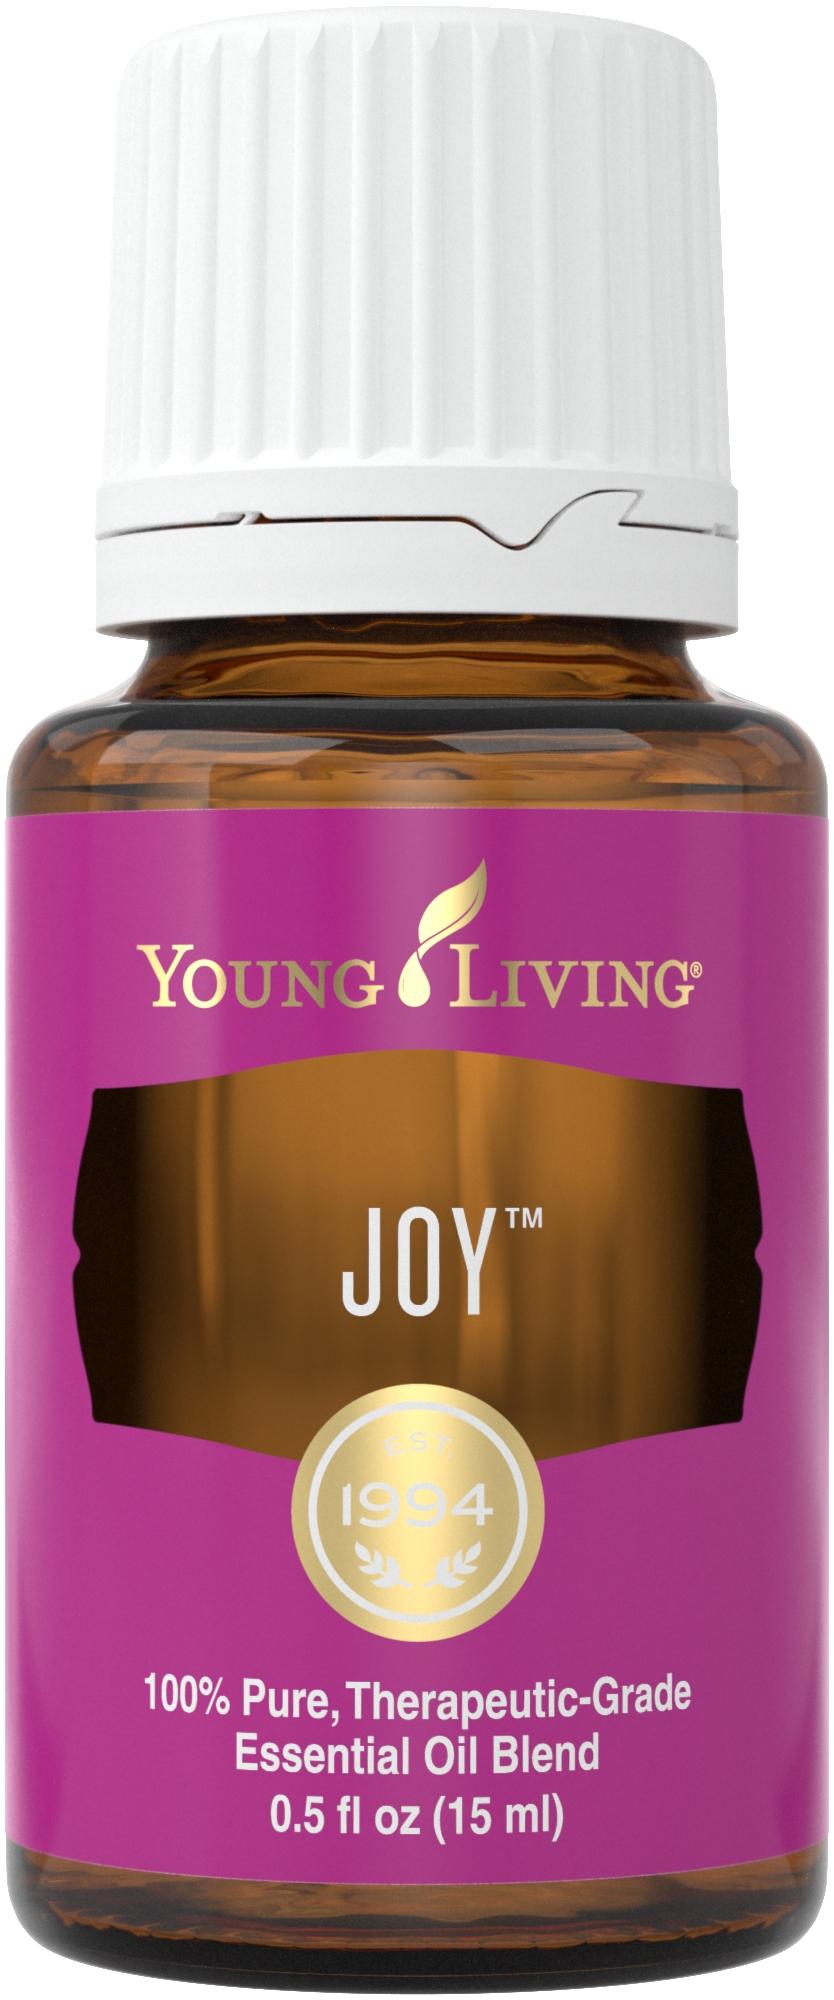 Campuran minyak esensial Joy